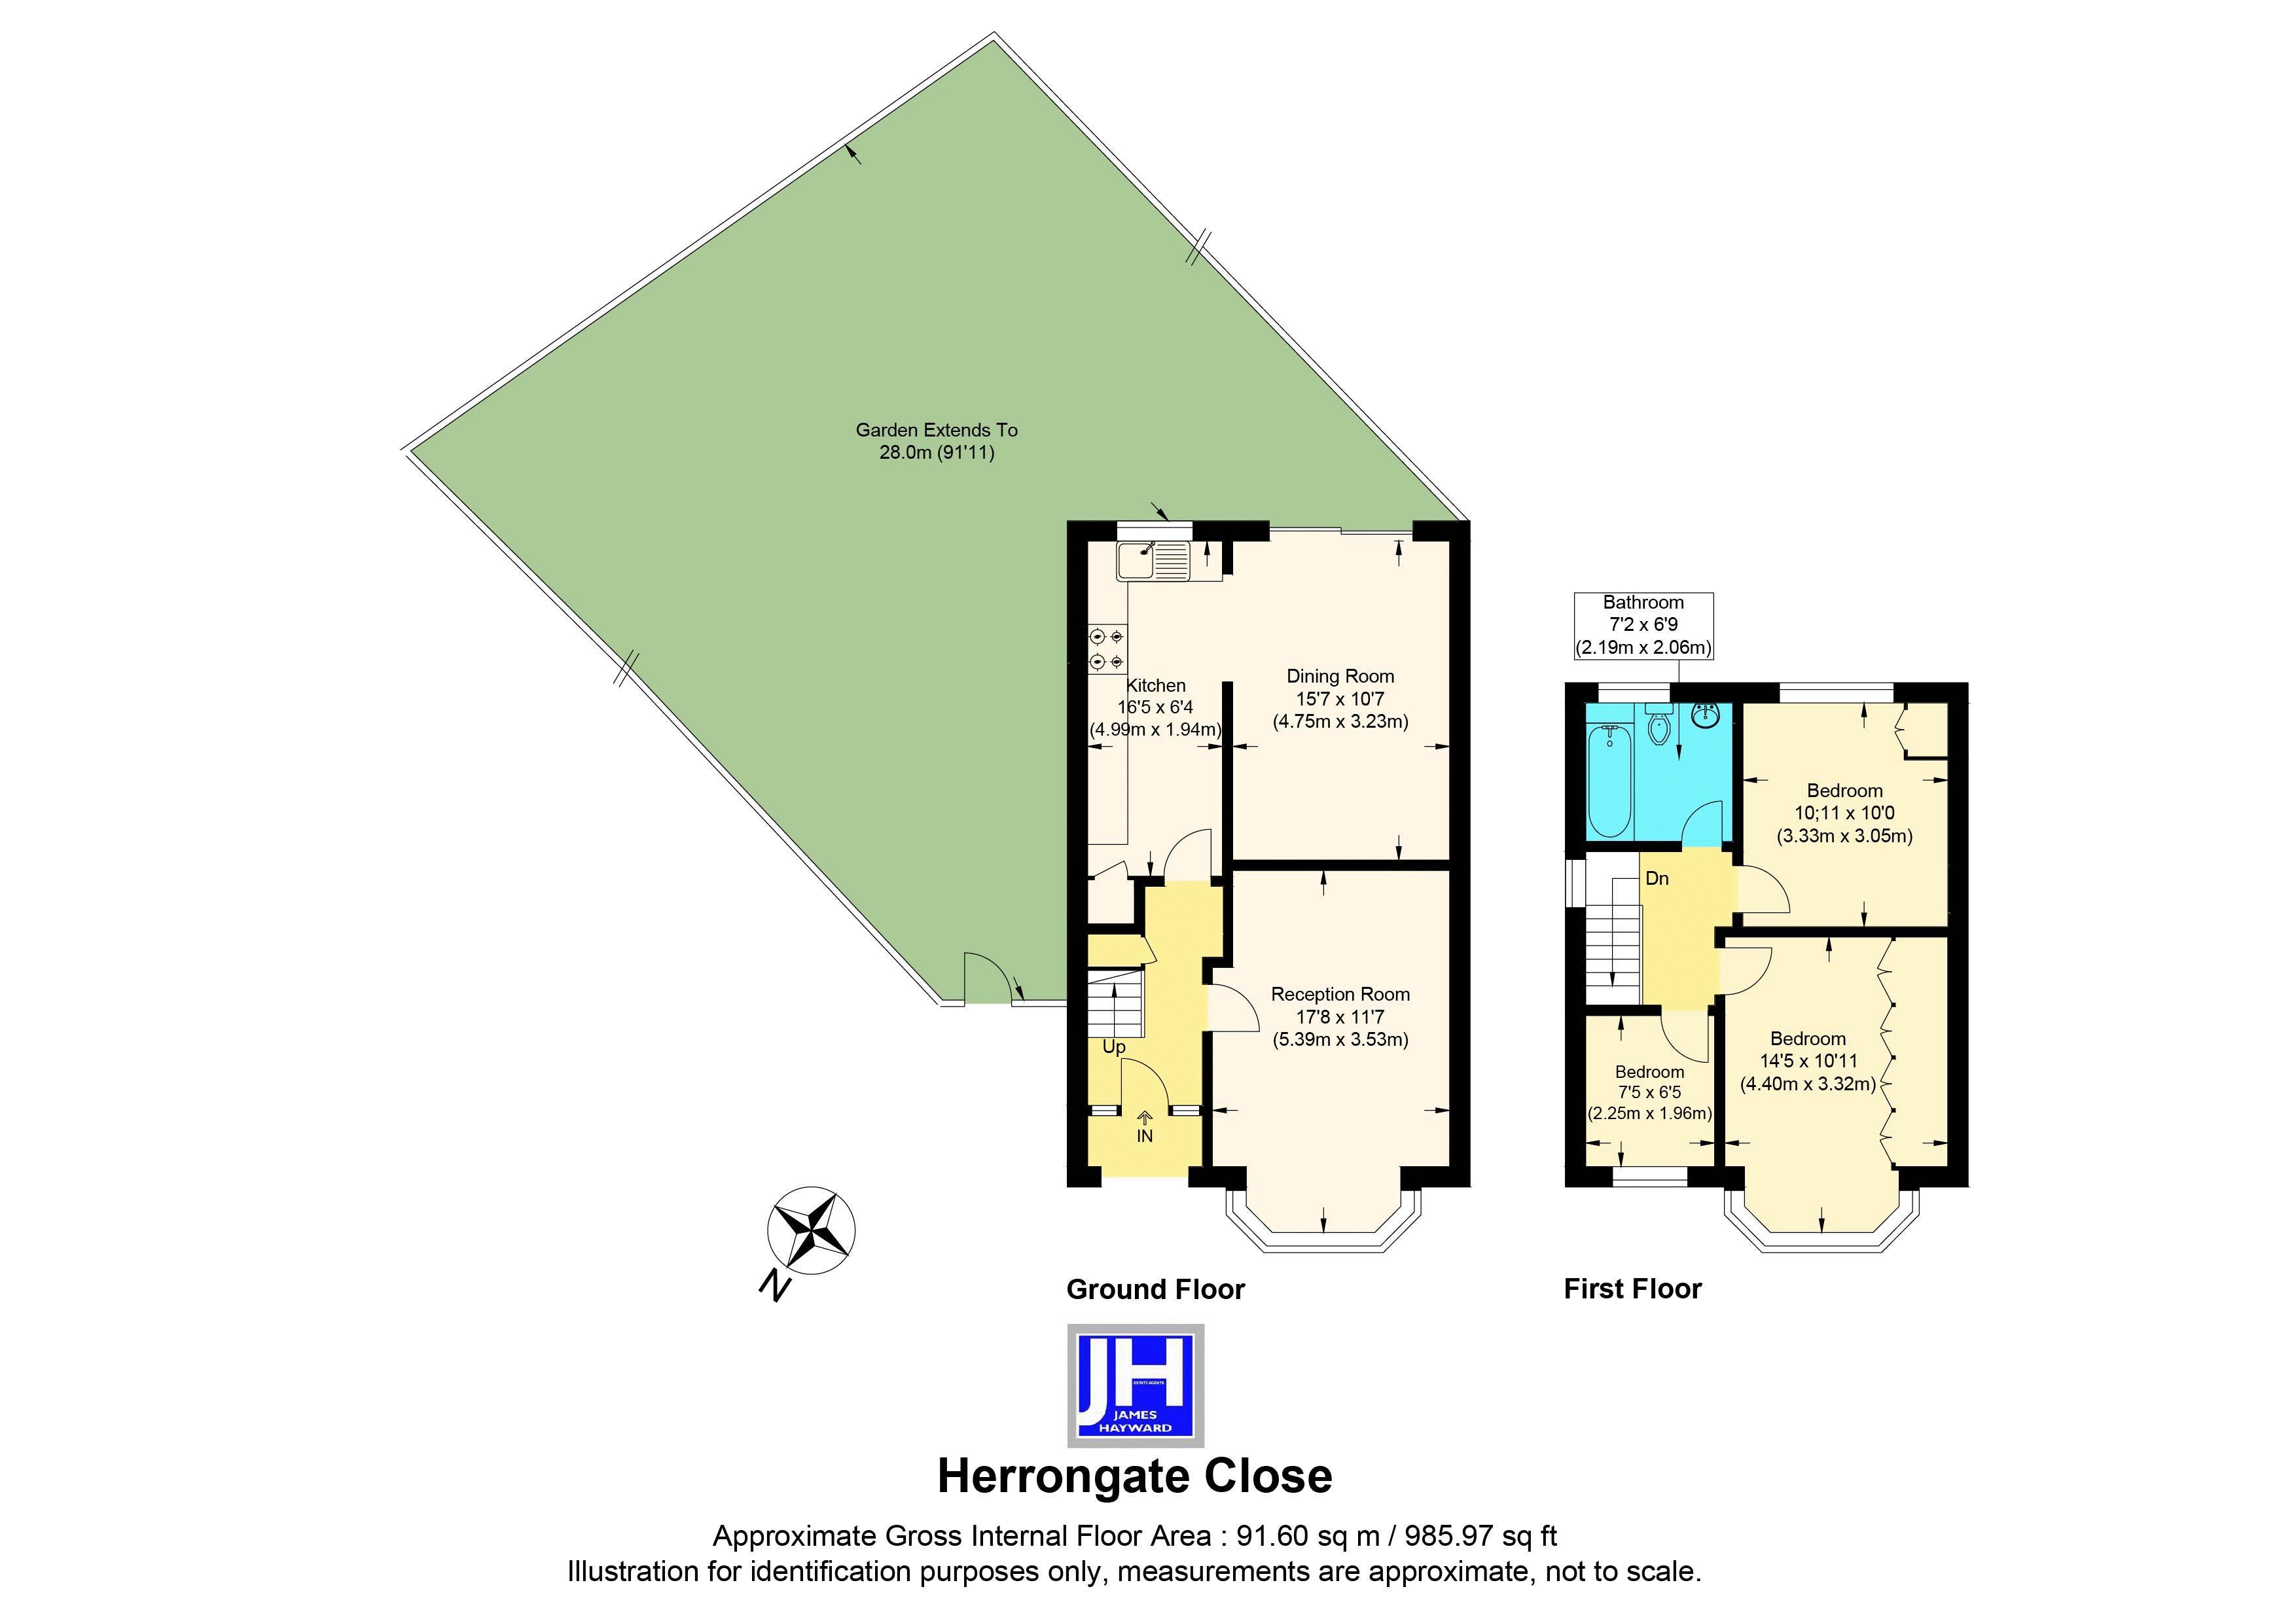 Herrongate Close